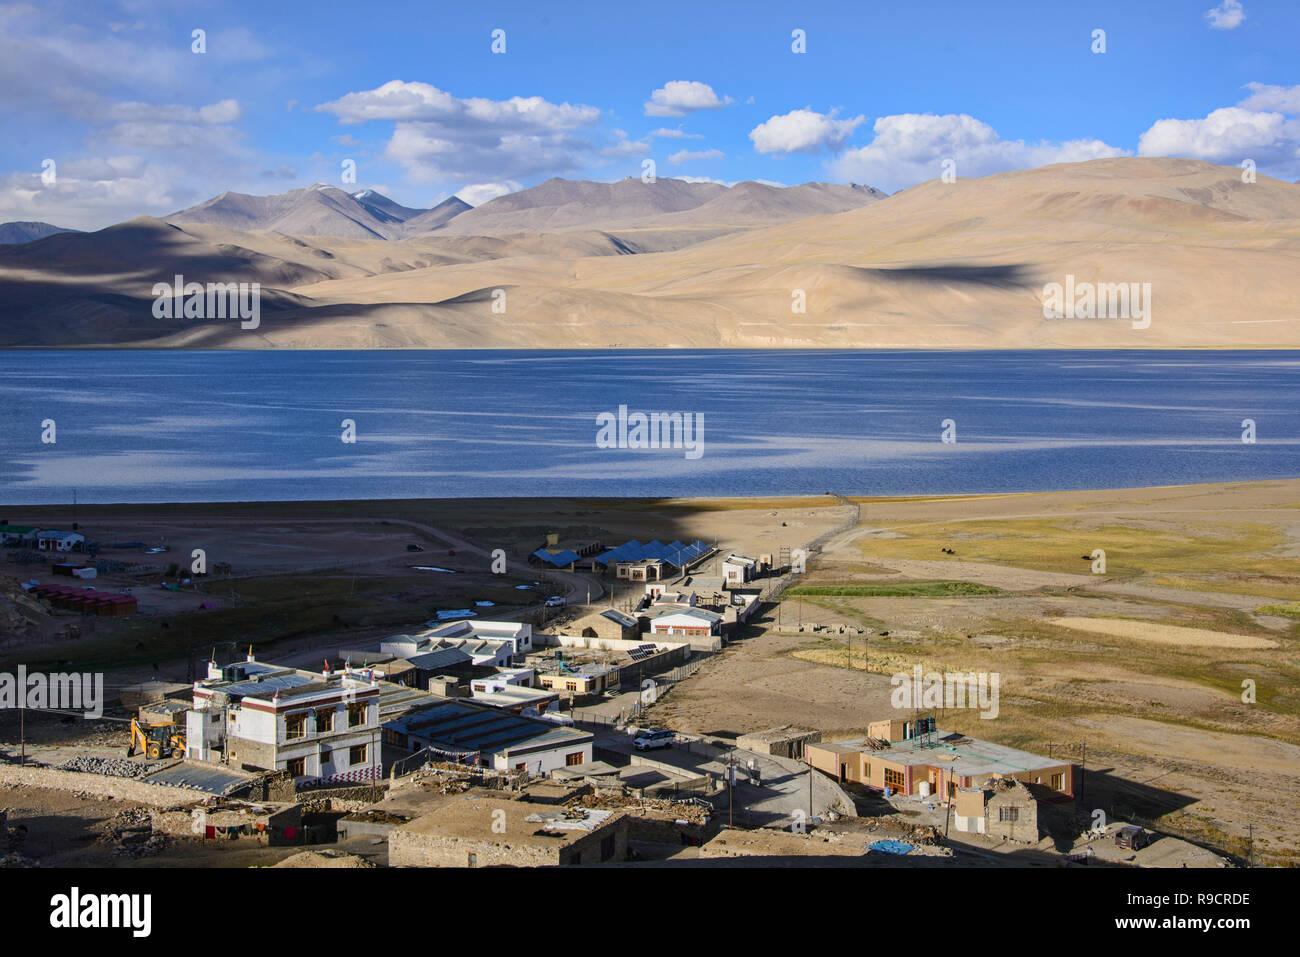 Tso Moriri Lake and Korzok village, Ladakh, India - Stock Image